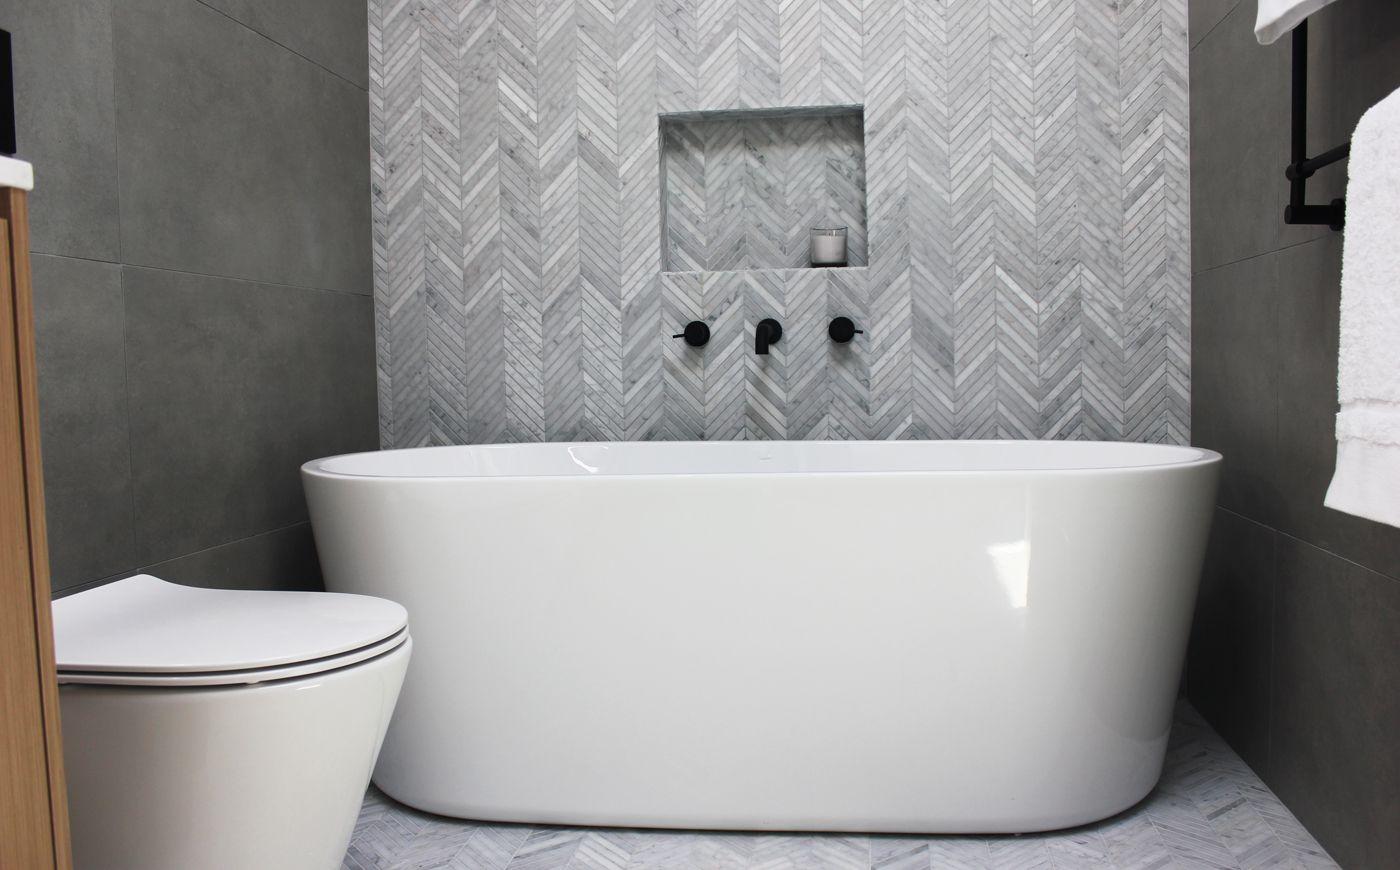 Surface gallery marble tiles limestone tiles travertine tiles tile doublecrazyfo Image collections